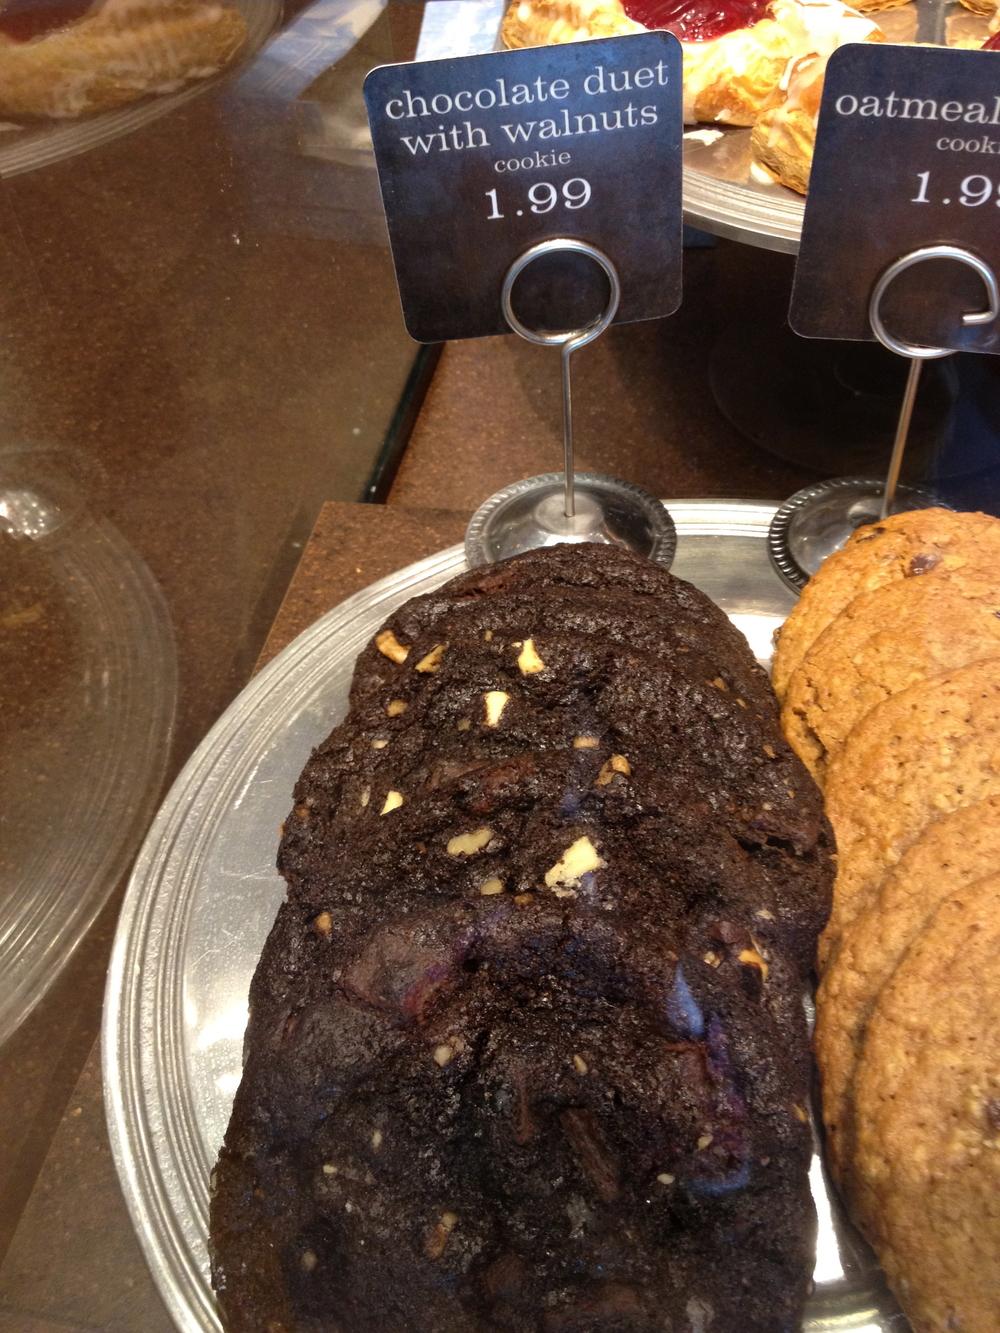 Panera Bread's Chocolate Walnut Duet Cookie